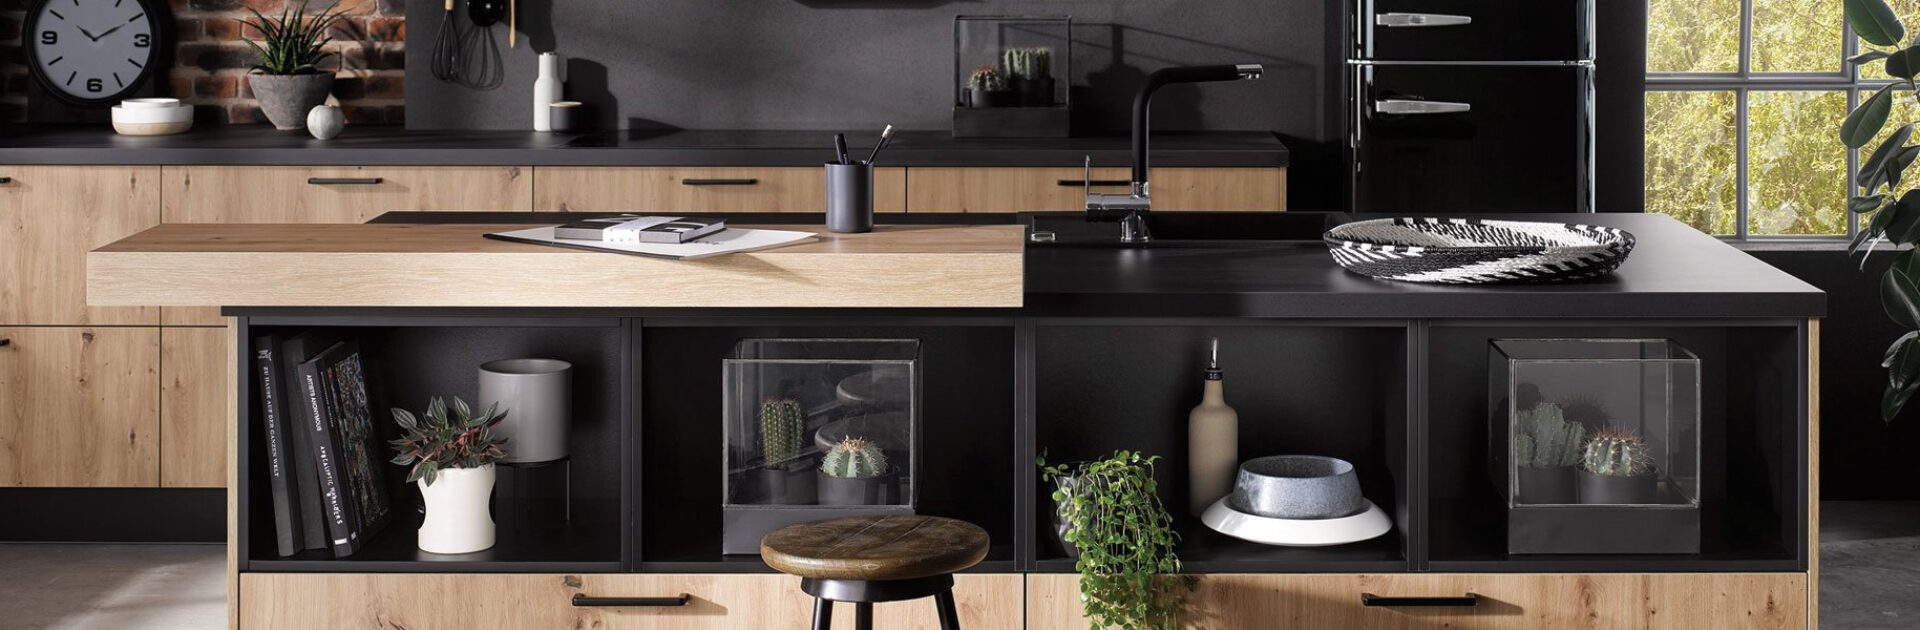 Keukens Deventer | Satink Keukens